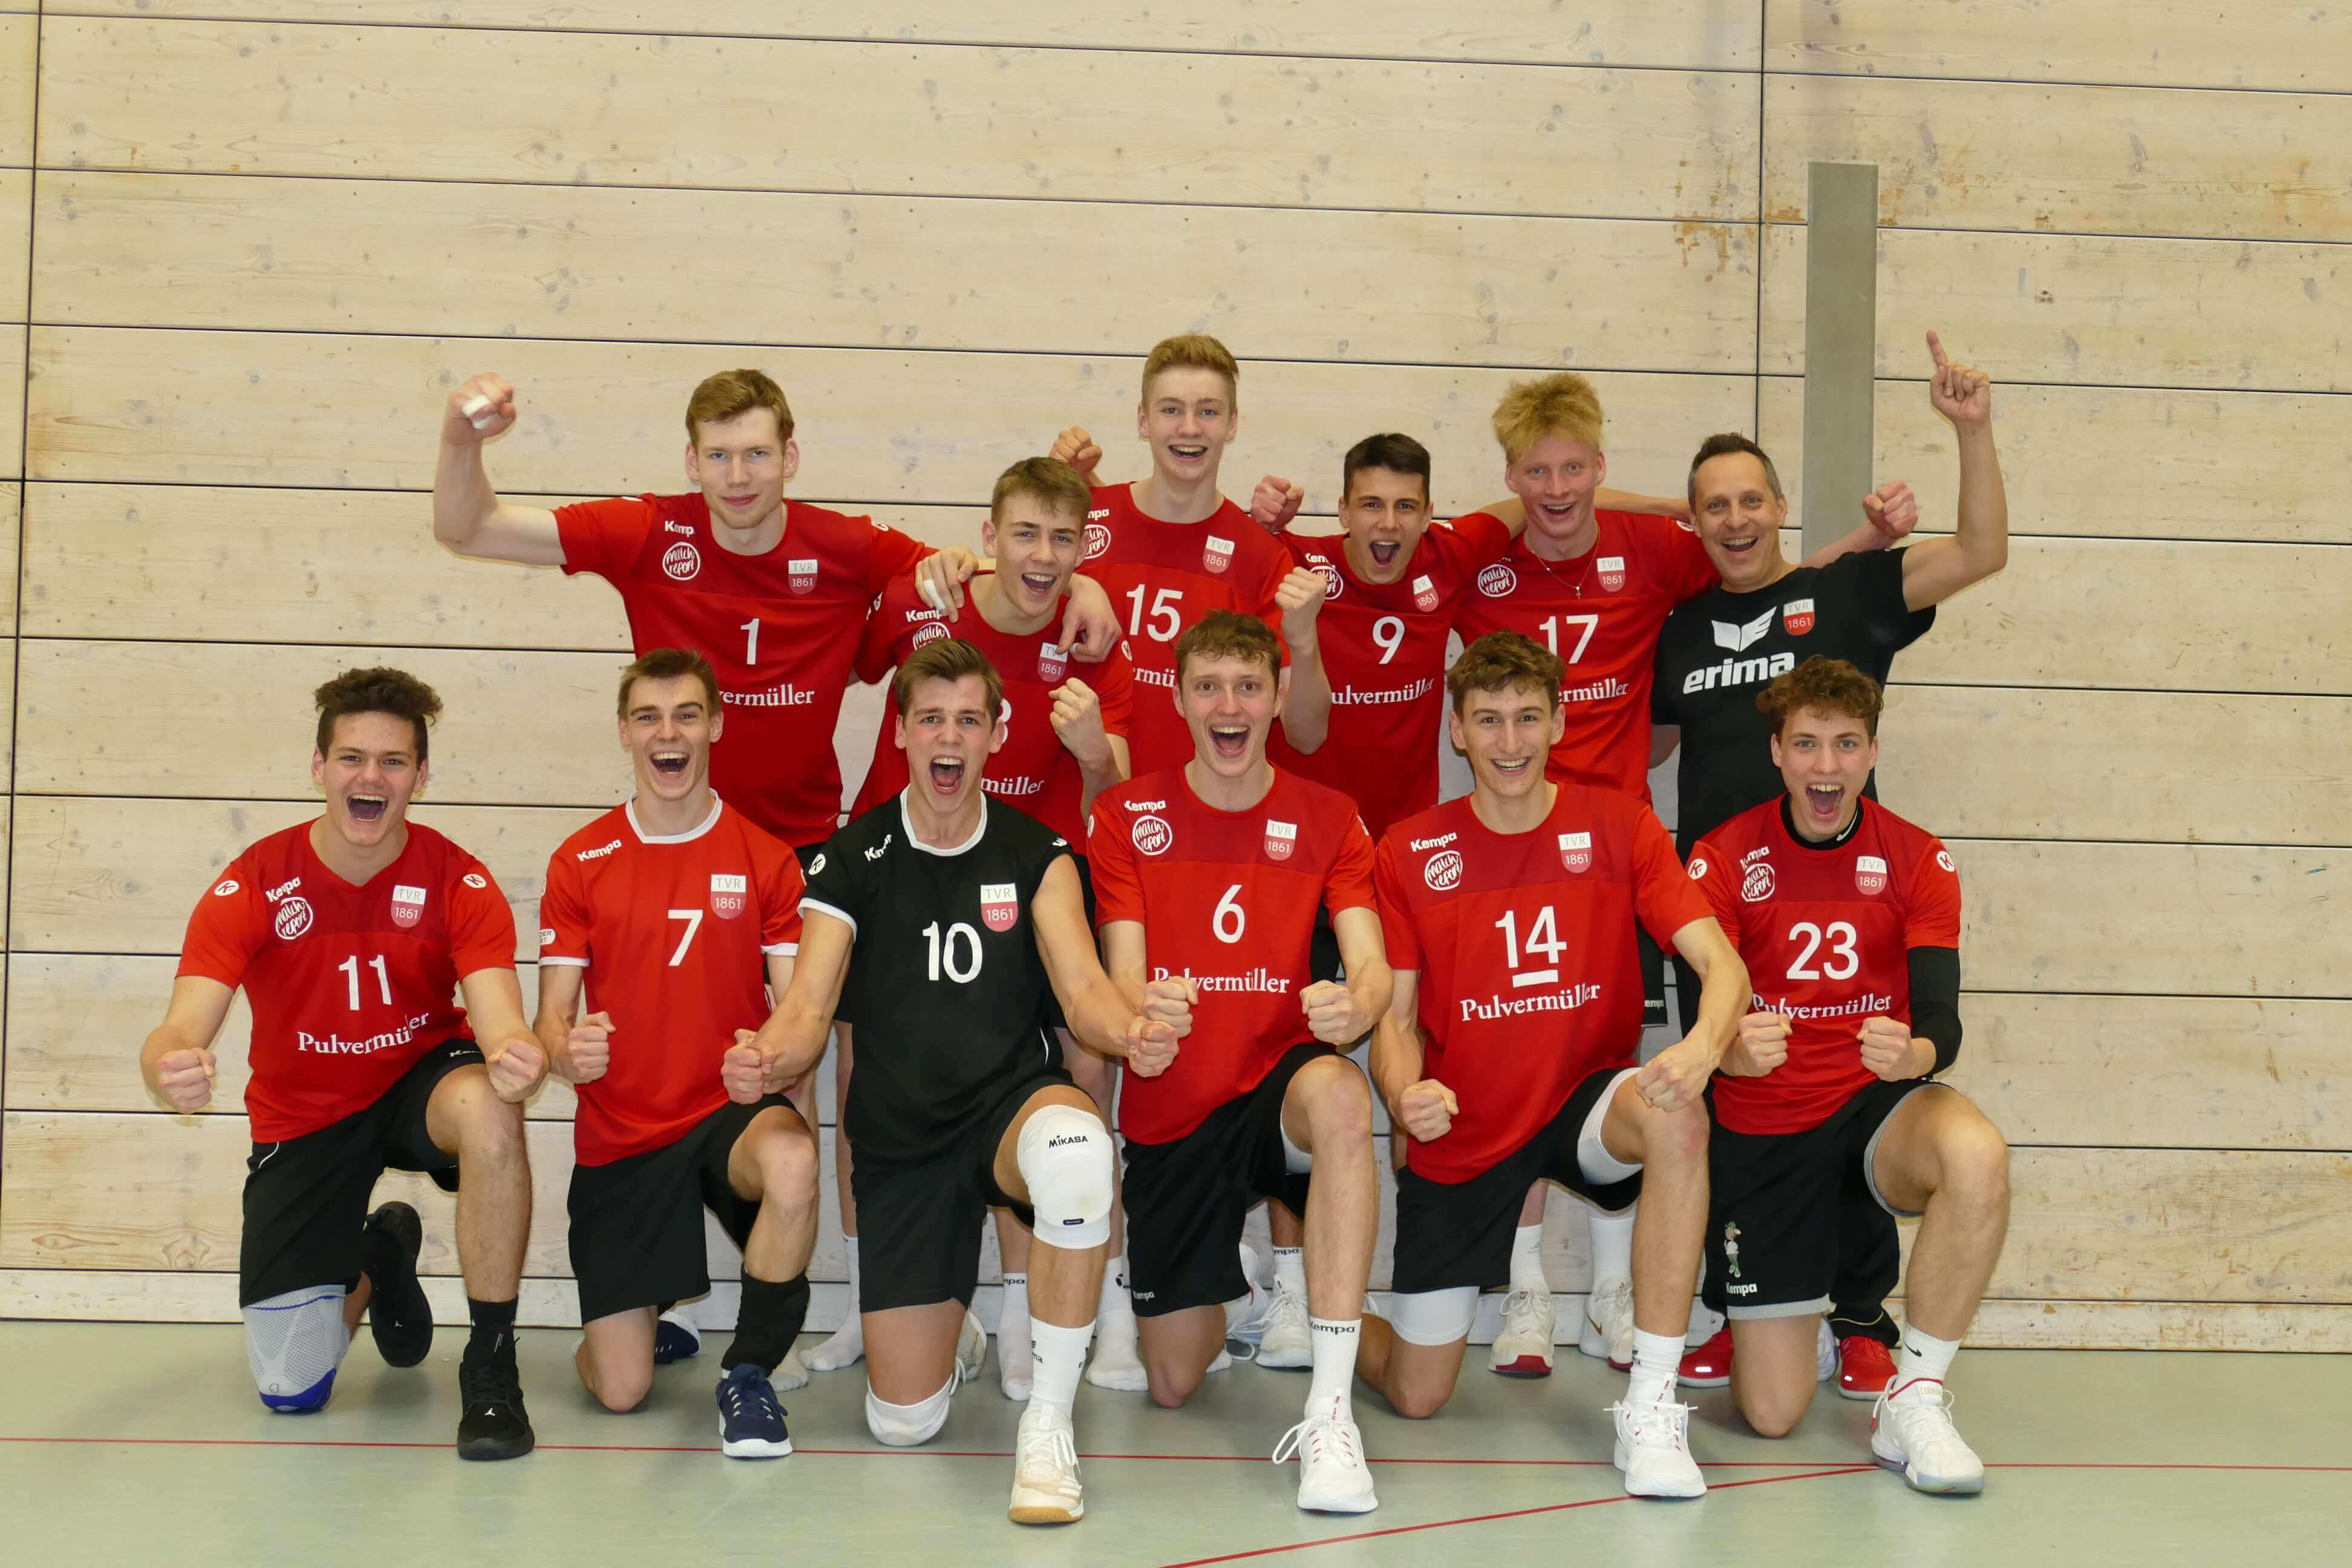 Team TVR